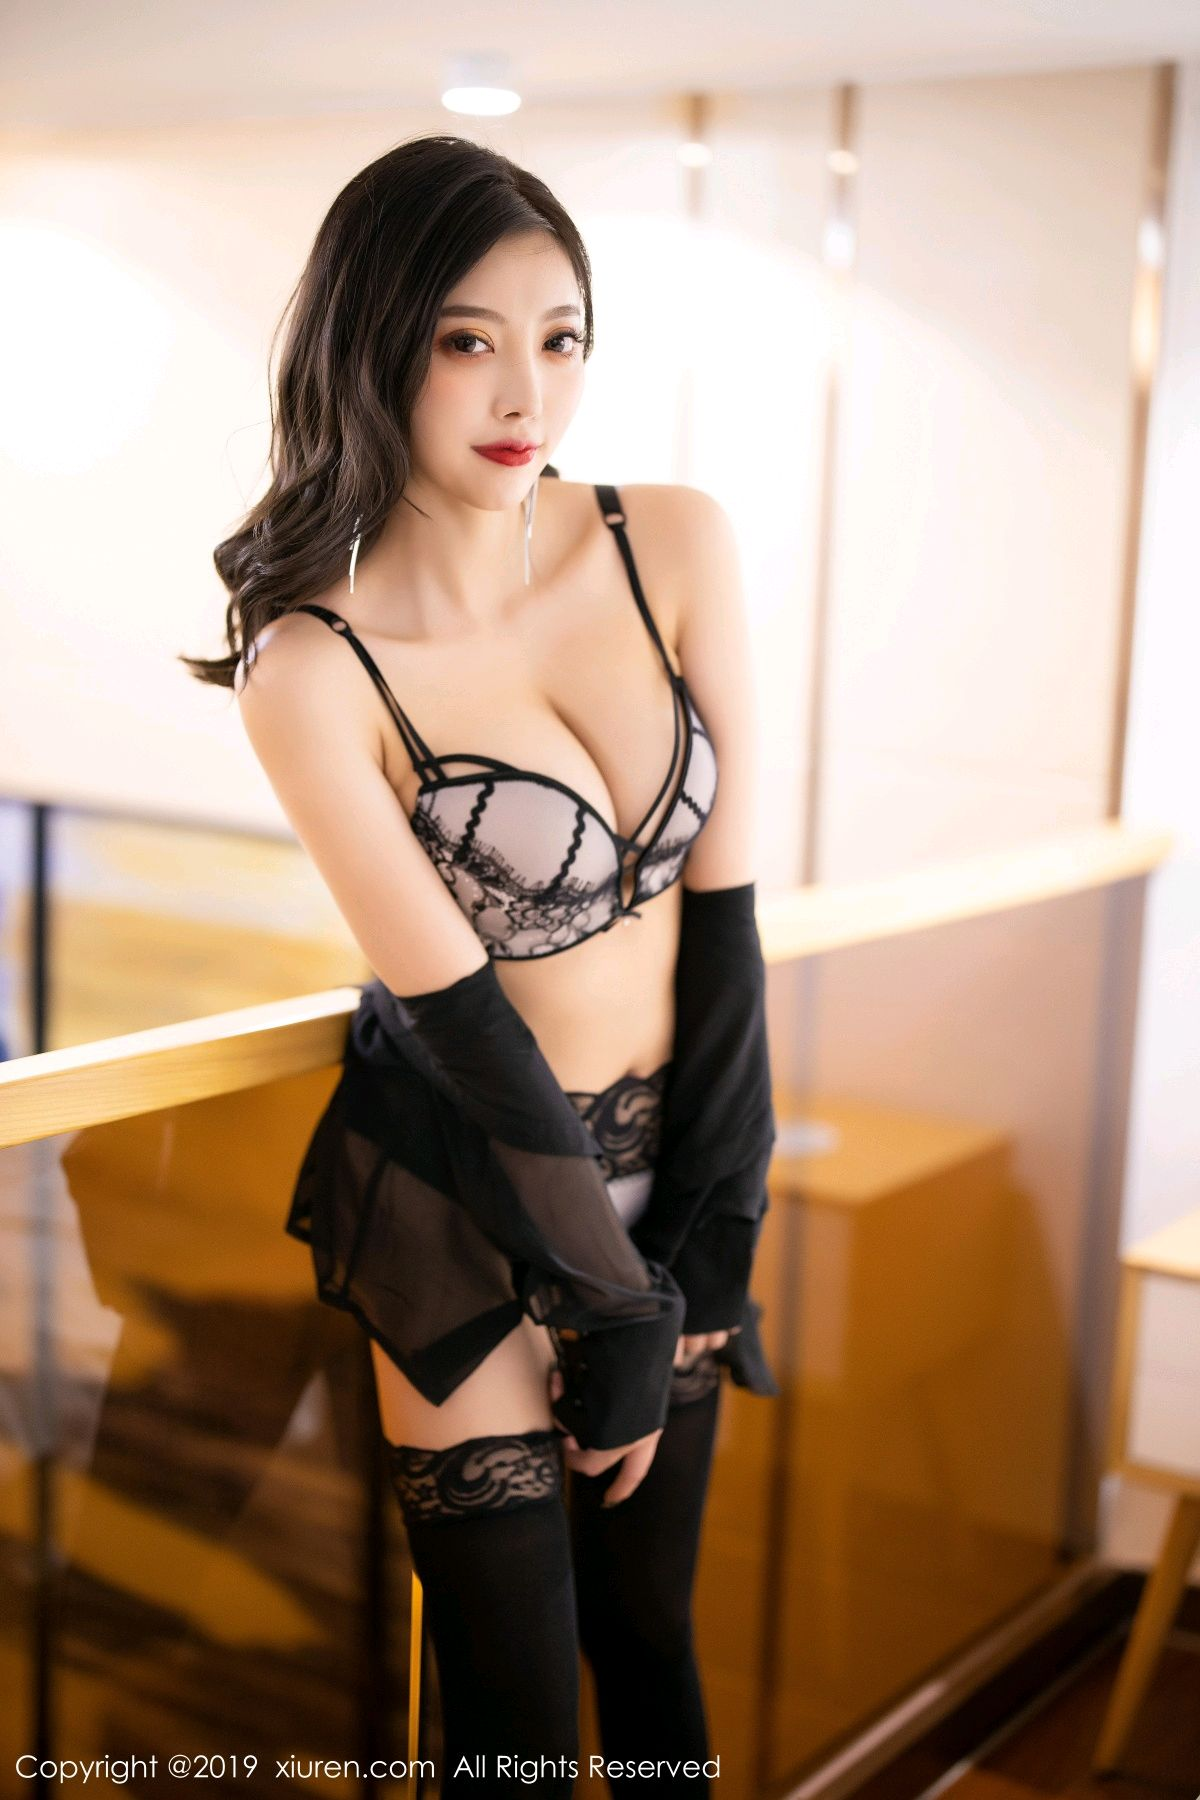 [XiuRen] Vol.1778 Yang Chen Chen 59P, Underwear, Xiuren, Yang Chen Chen